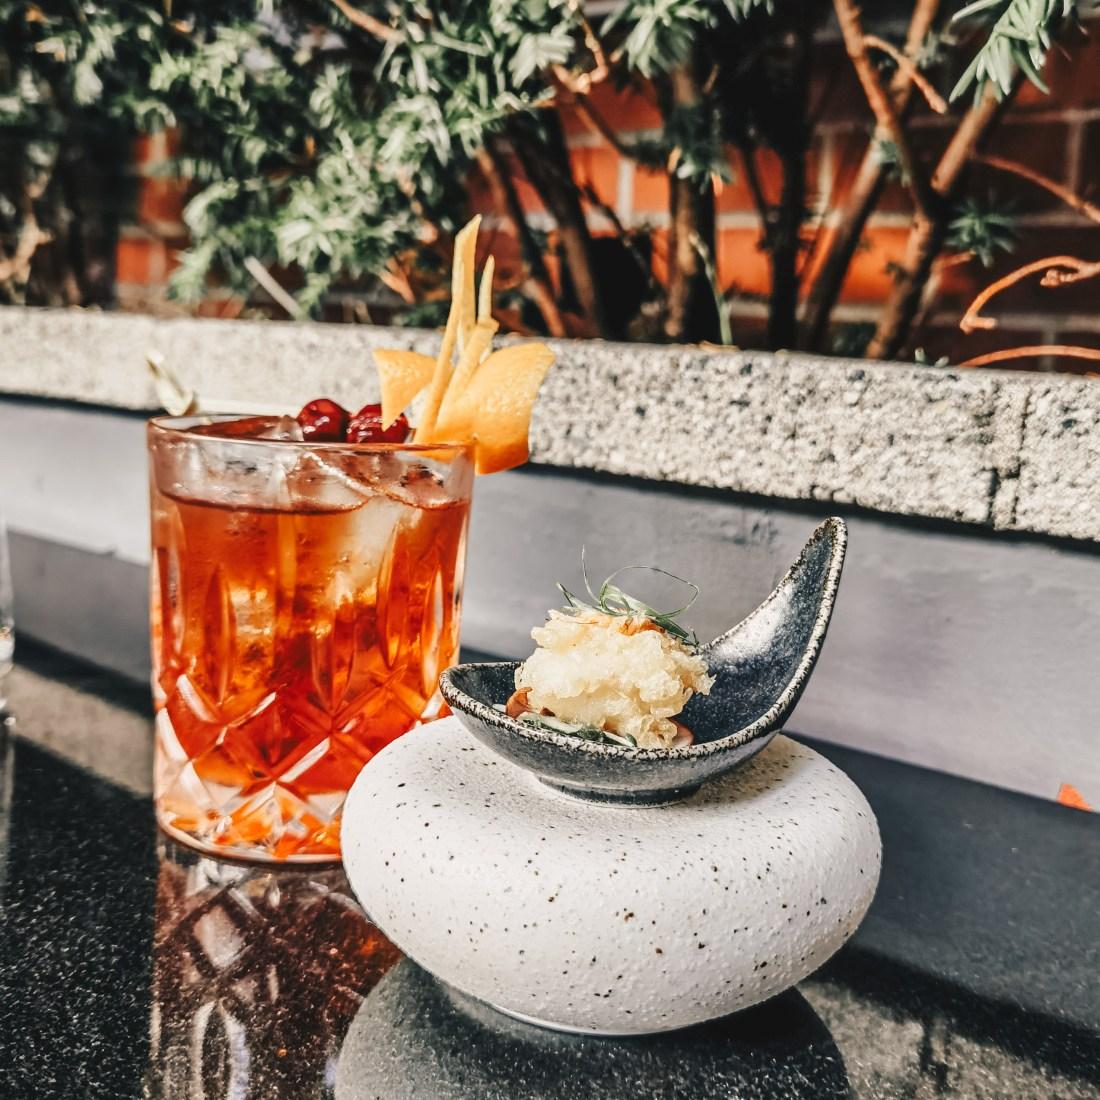 Minami Yaletown Vancouver - Shokai Menu - Chef's Tasting Menu - Amuse Bouche